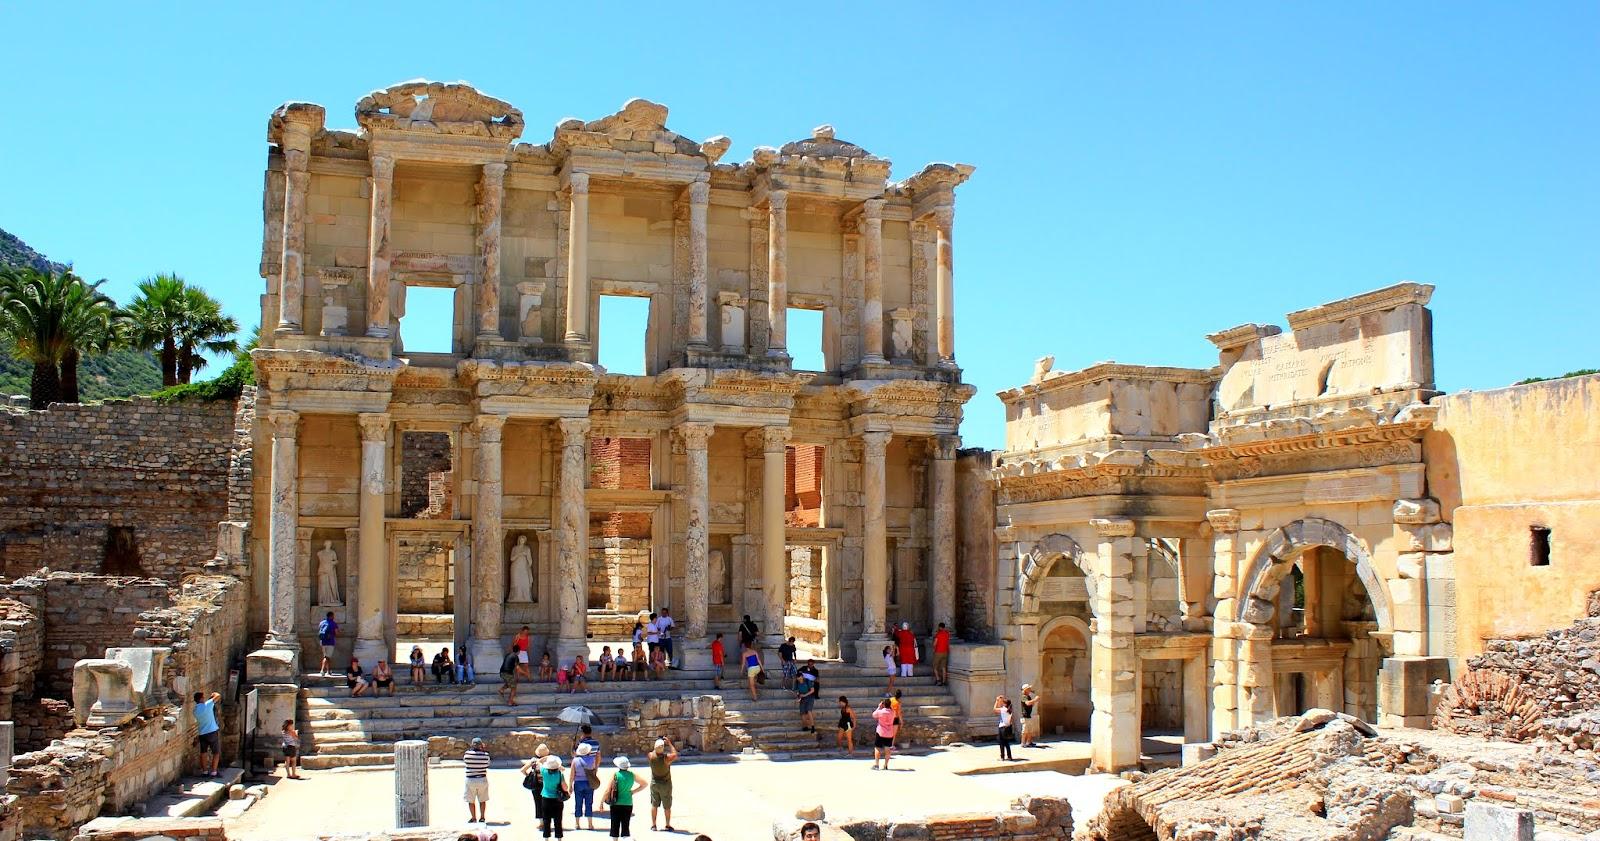 Efes Antik Kent - Gezginler Kulübü